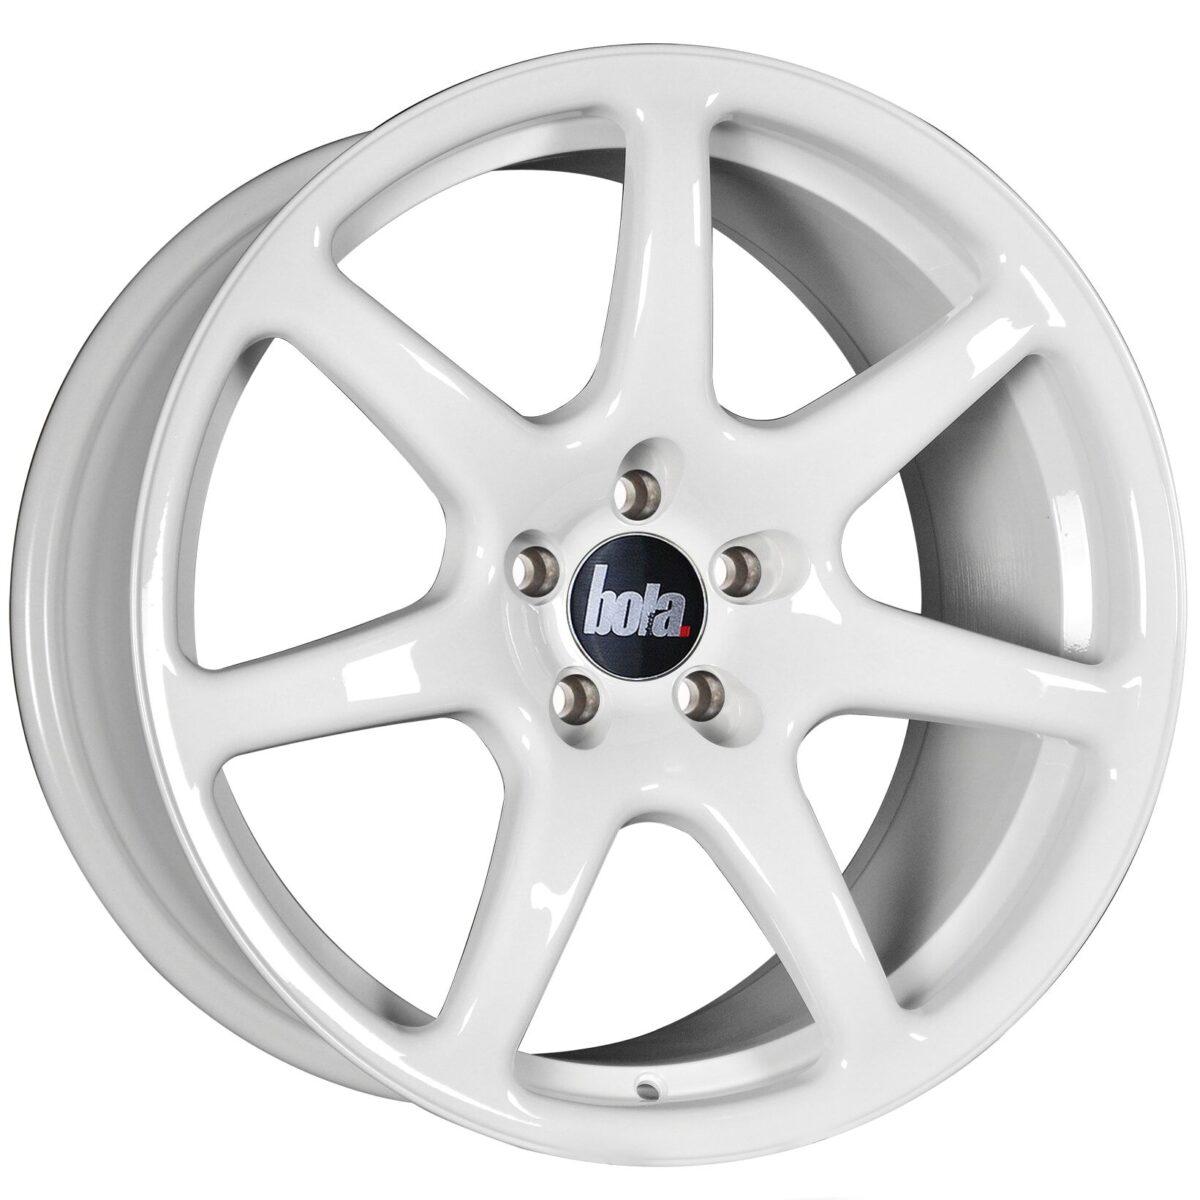 "18"" BOLA B7 Wheels - White - VW / Audi / Mercedes - 5x112"